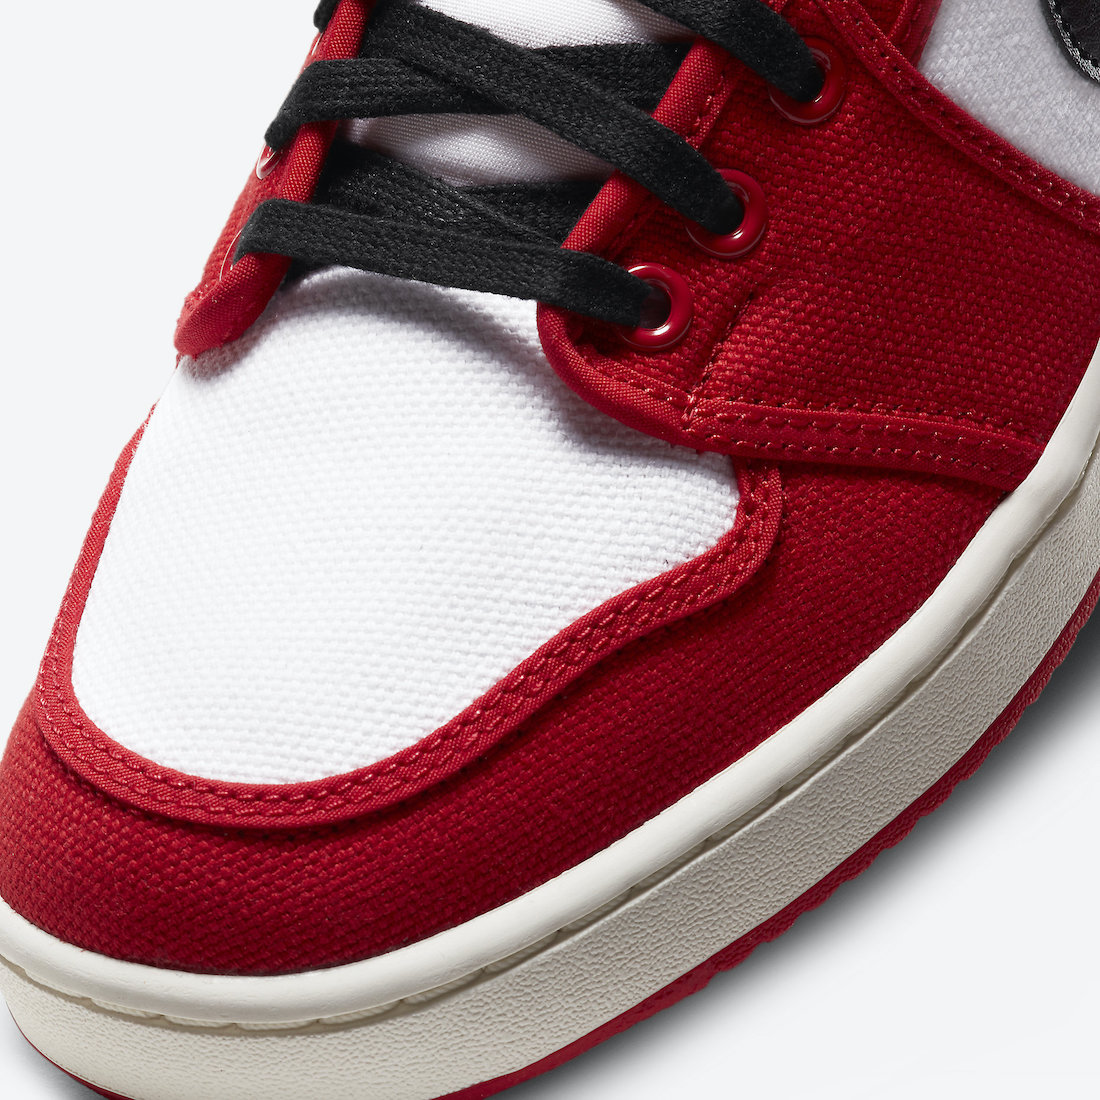 Air-Jordan-1-KO-Chicago-DA9089-100-2021-Release-Date-Price-6